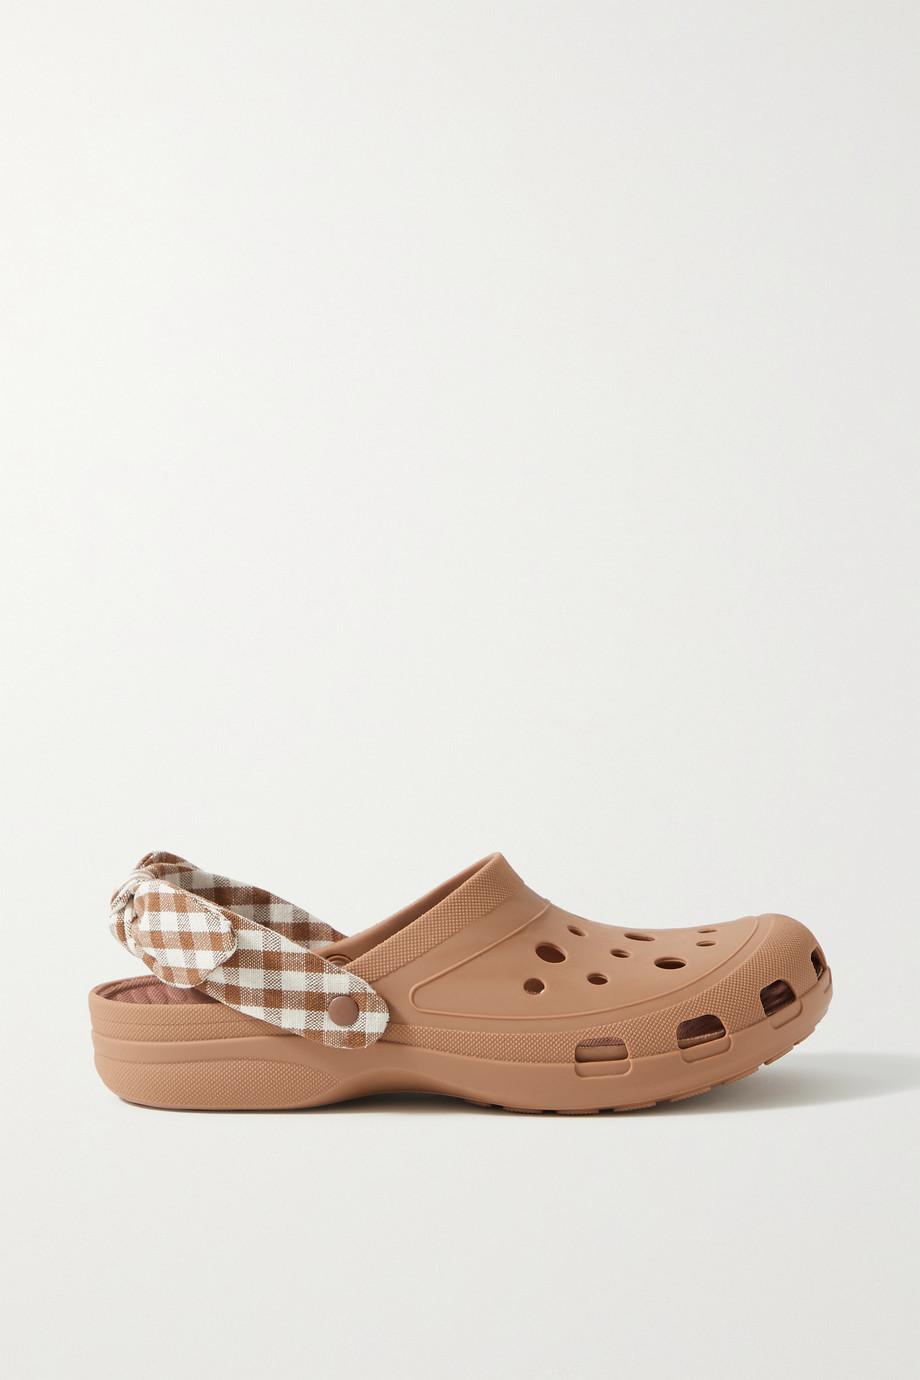 Loeffler Randall Ezra bow-embellished rubber clogs